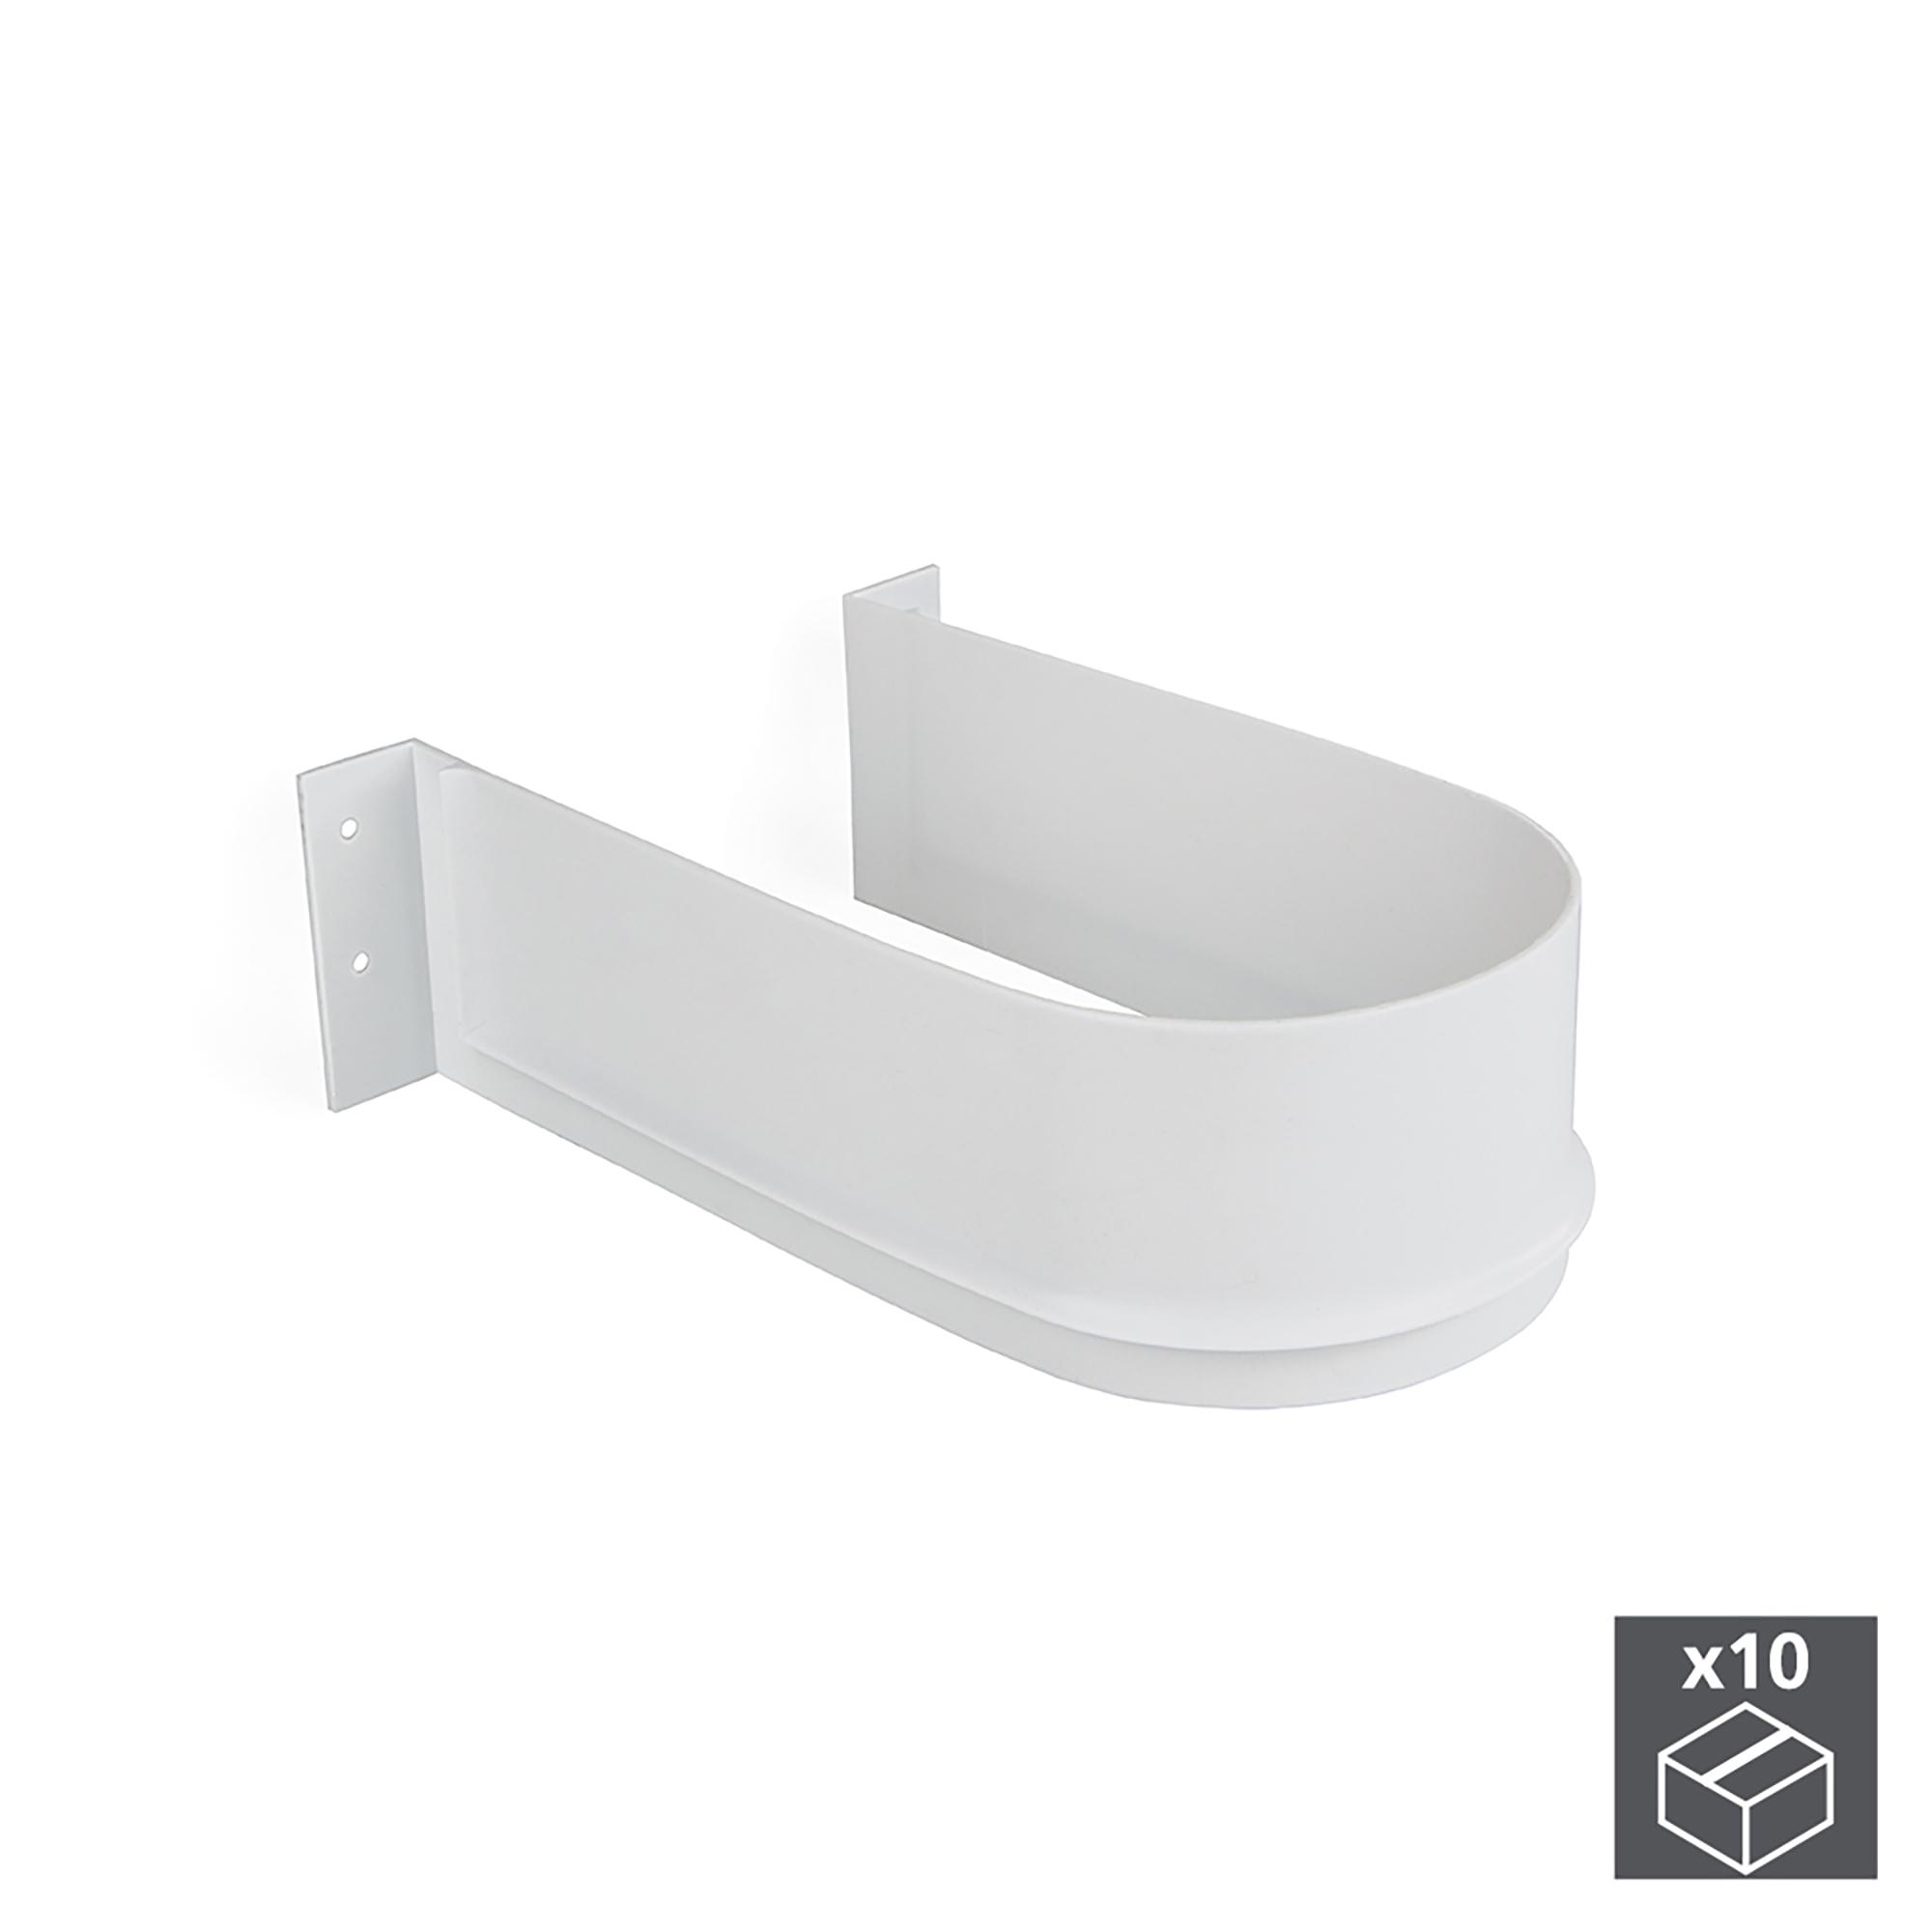 Emuca Salva sifone per cassetti del bagno, curvo, Plastica, Bianco, 10 u.